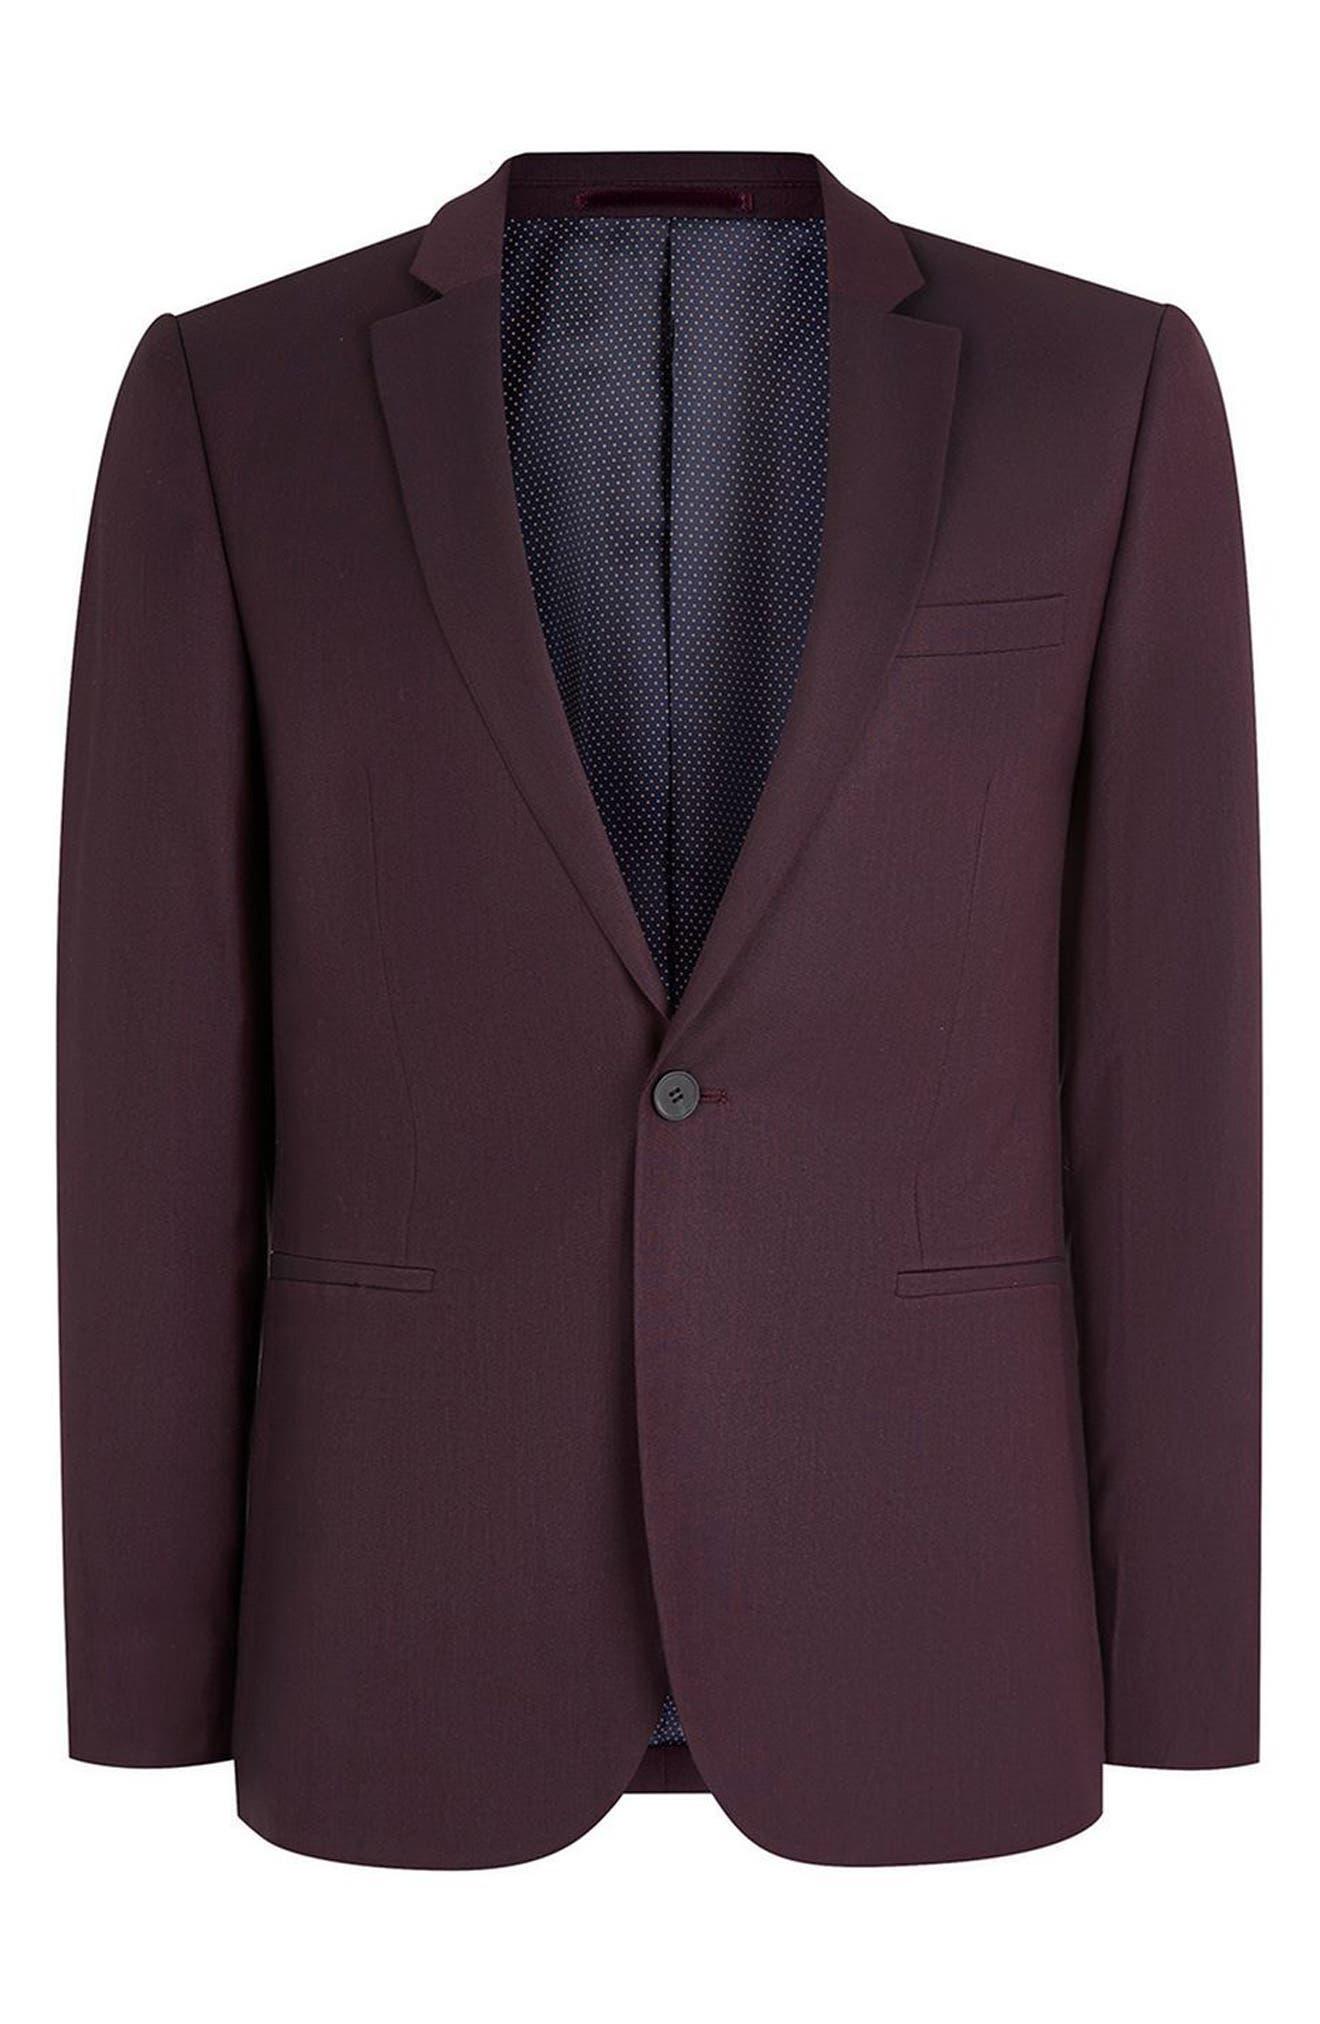 Skinny Fit Plum One-Button Suit Jacket,                             Alternate thumbnail 3, color,                             500